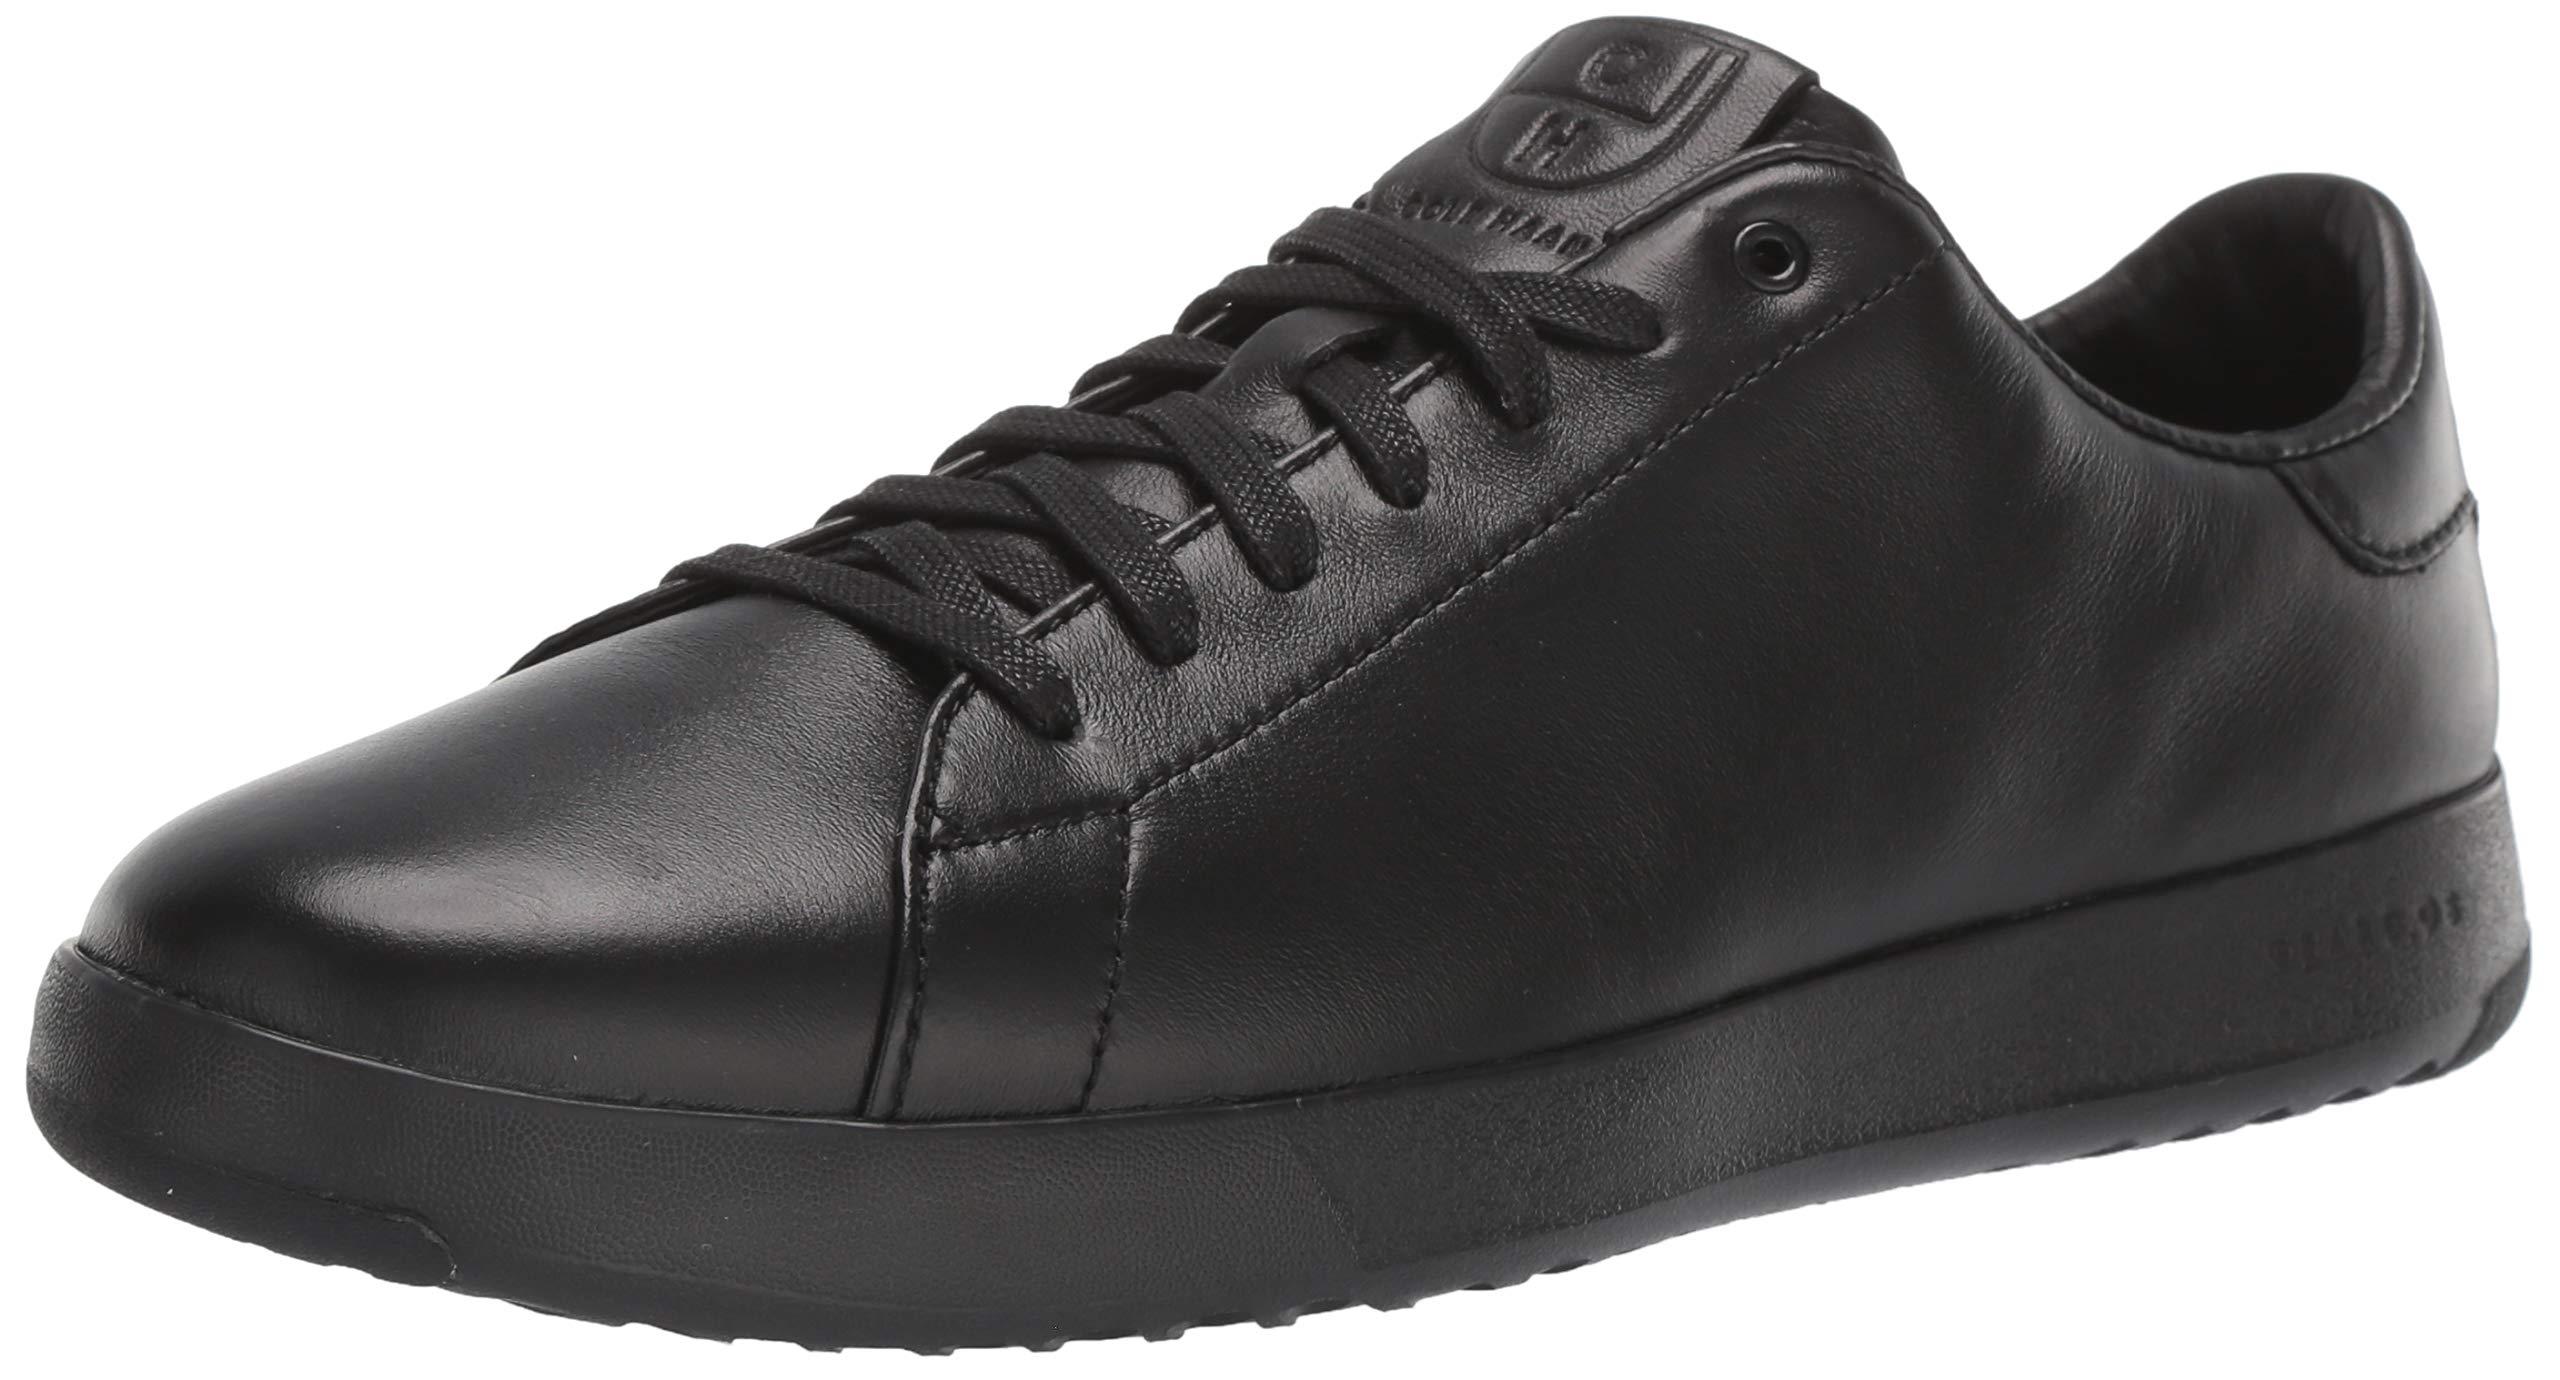 Cole Haan Men's Grandpro Tennis Fashion Sneaker, Black/British Tan, 7 M US